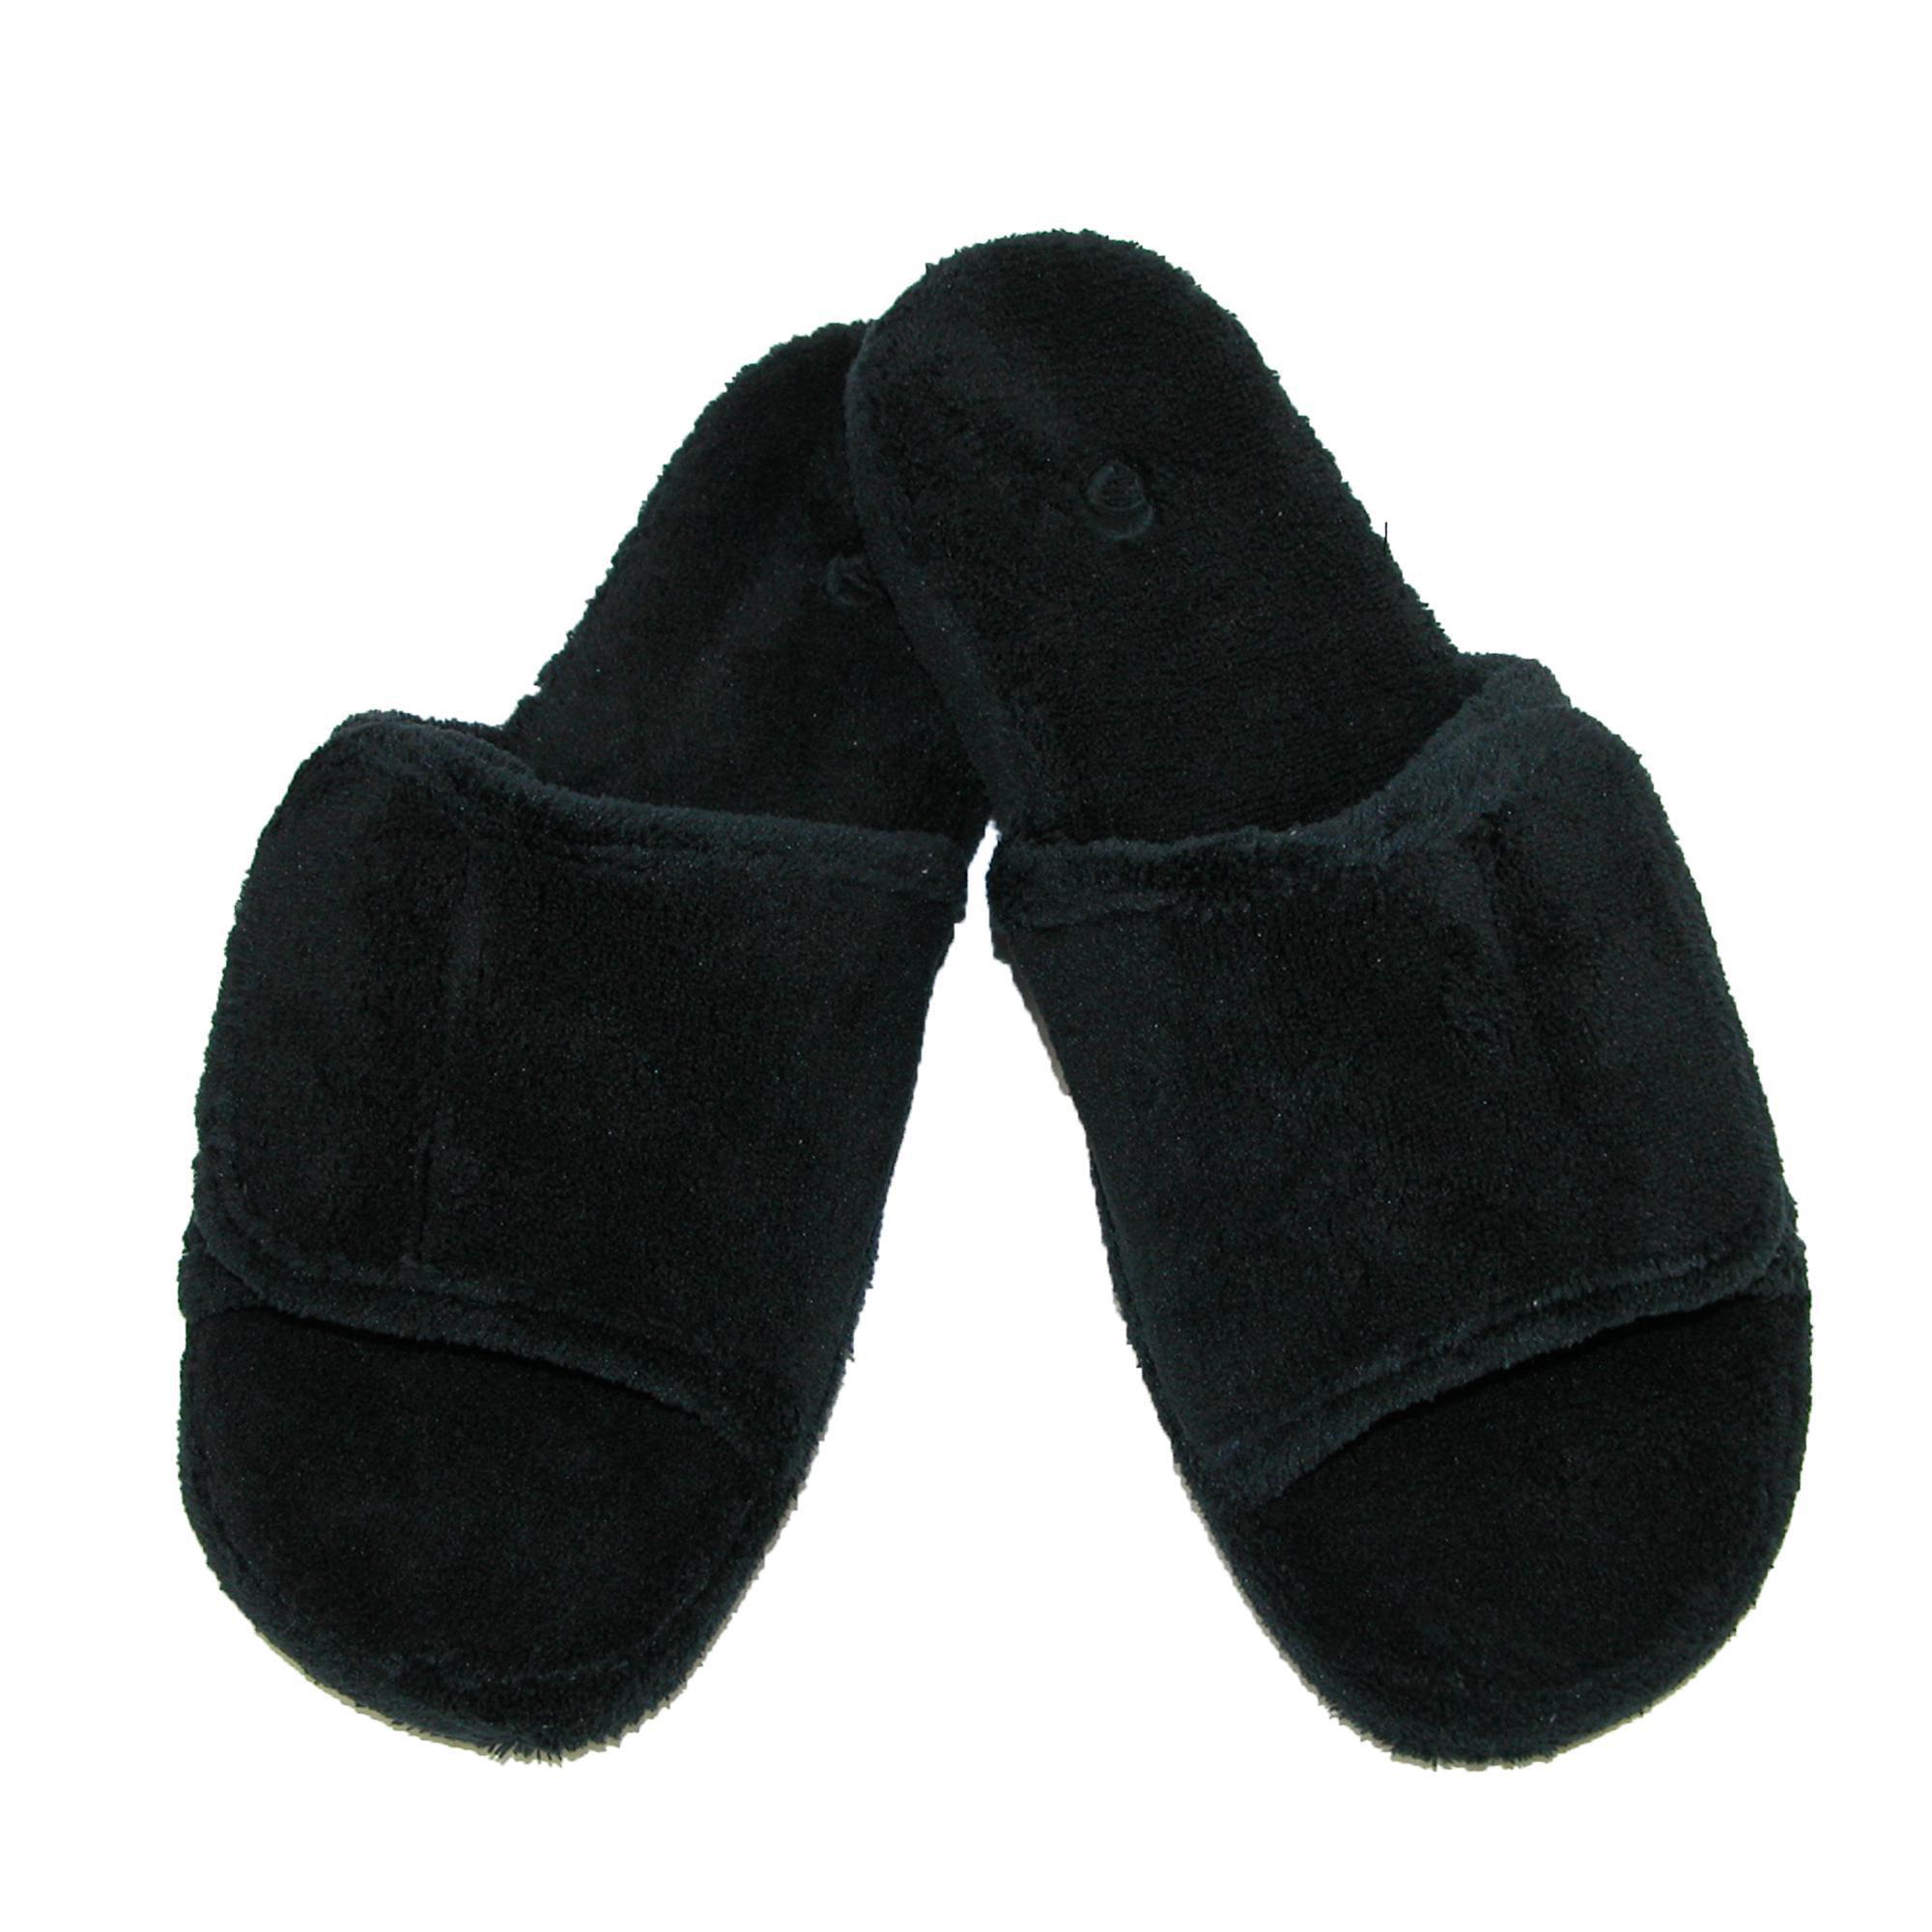 ad874d0905f Size Medium Acorn Men s Spa Slide Slippers